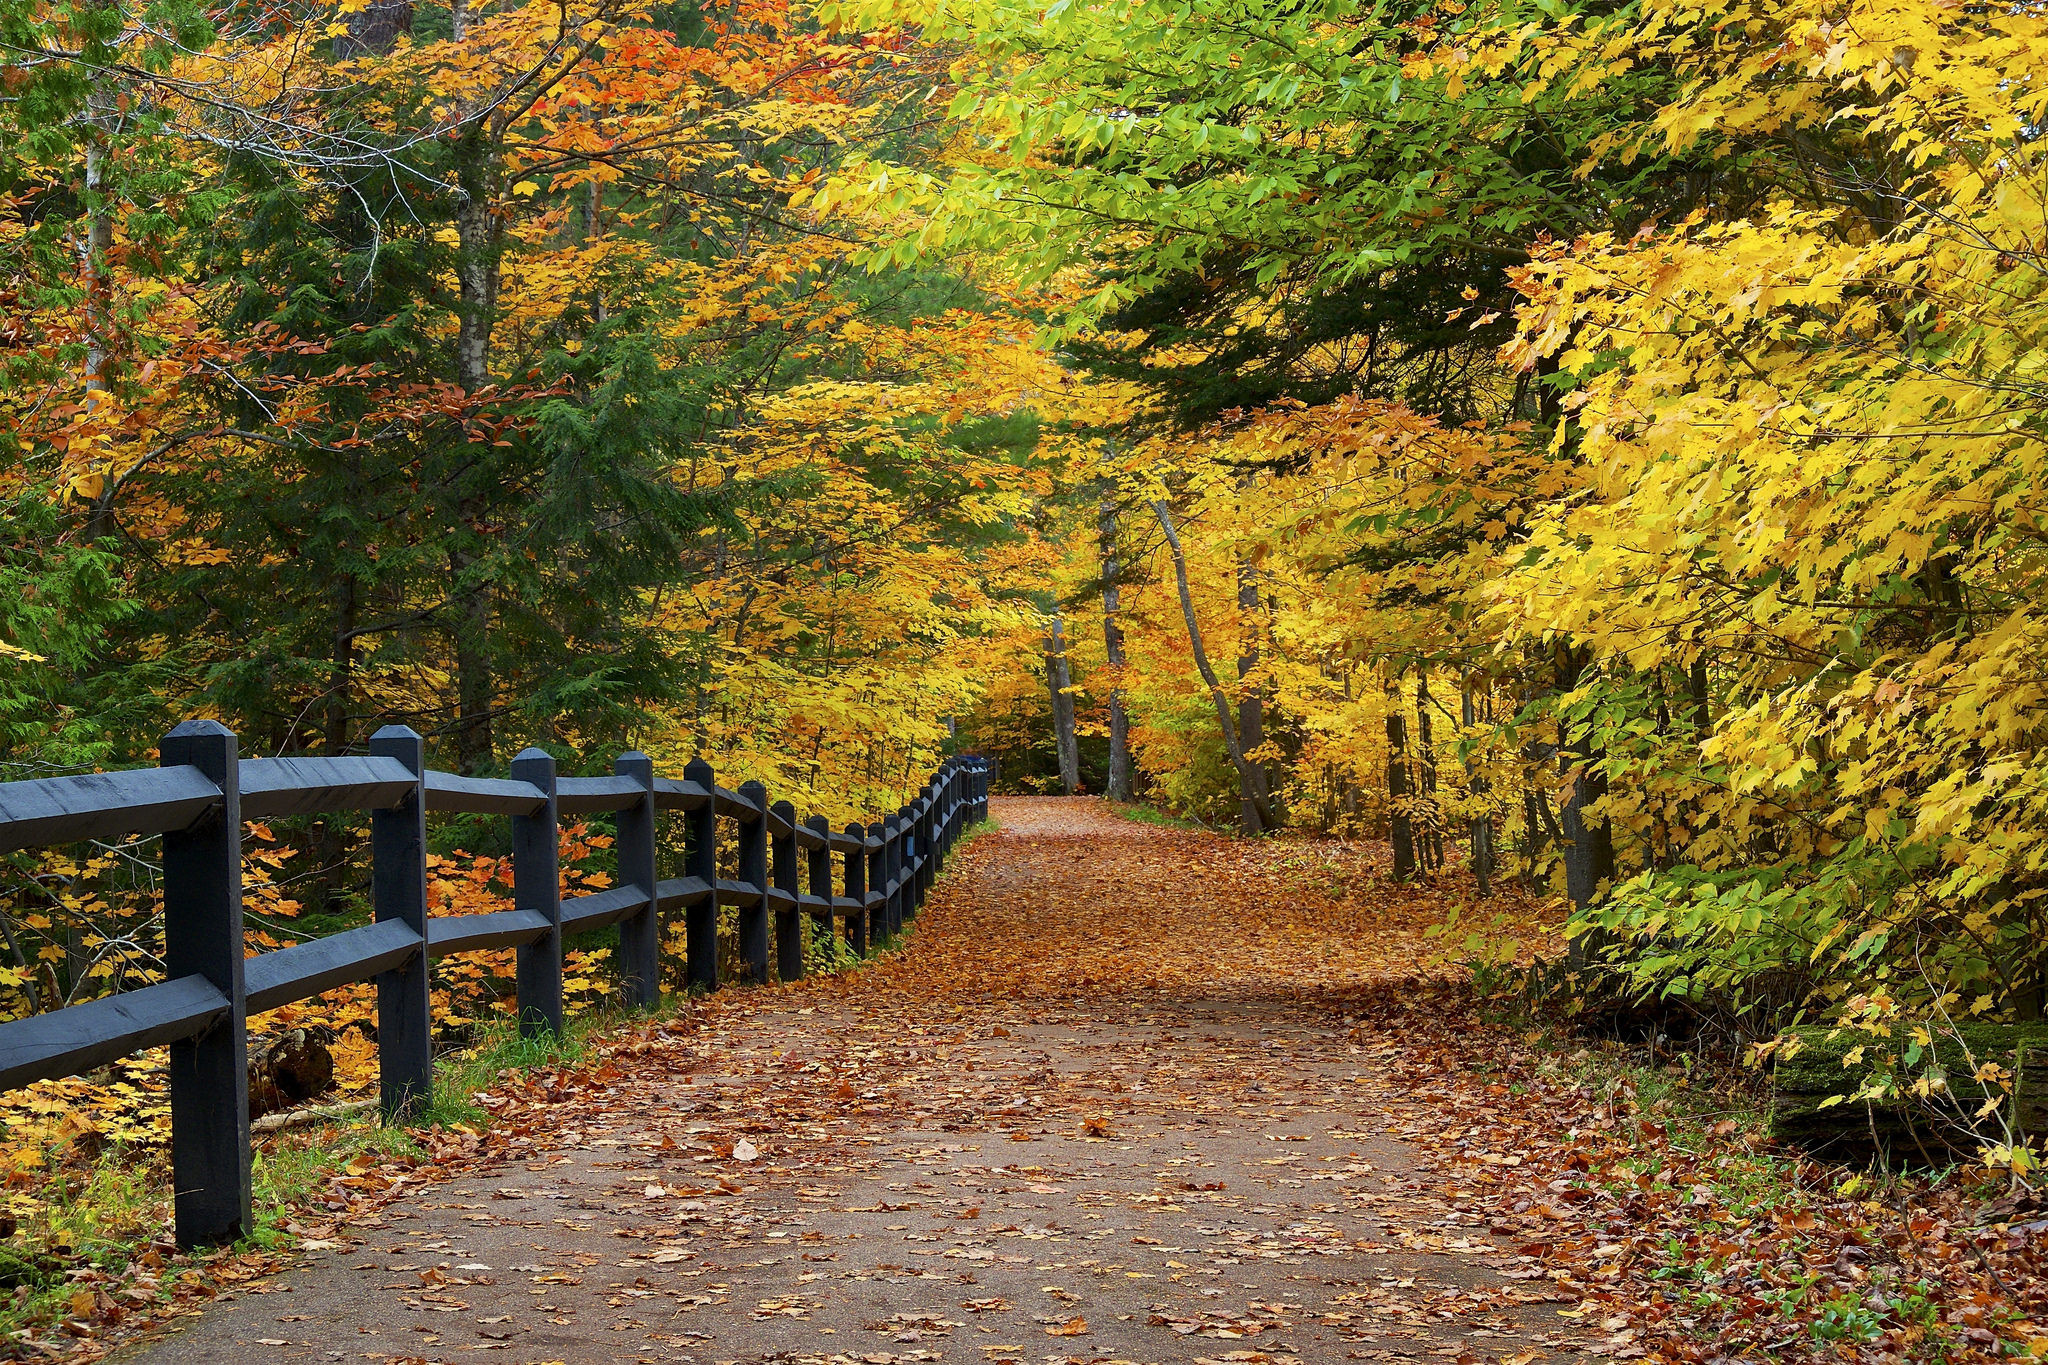 обои осень, лес, дорога, деревья картинки фото